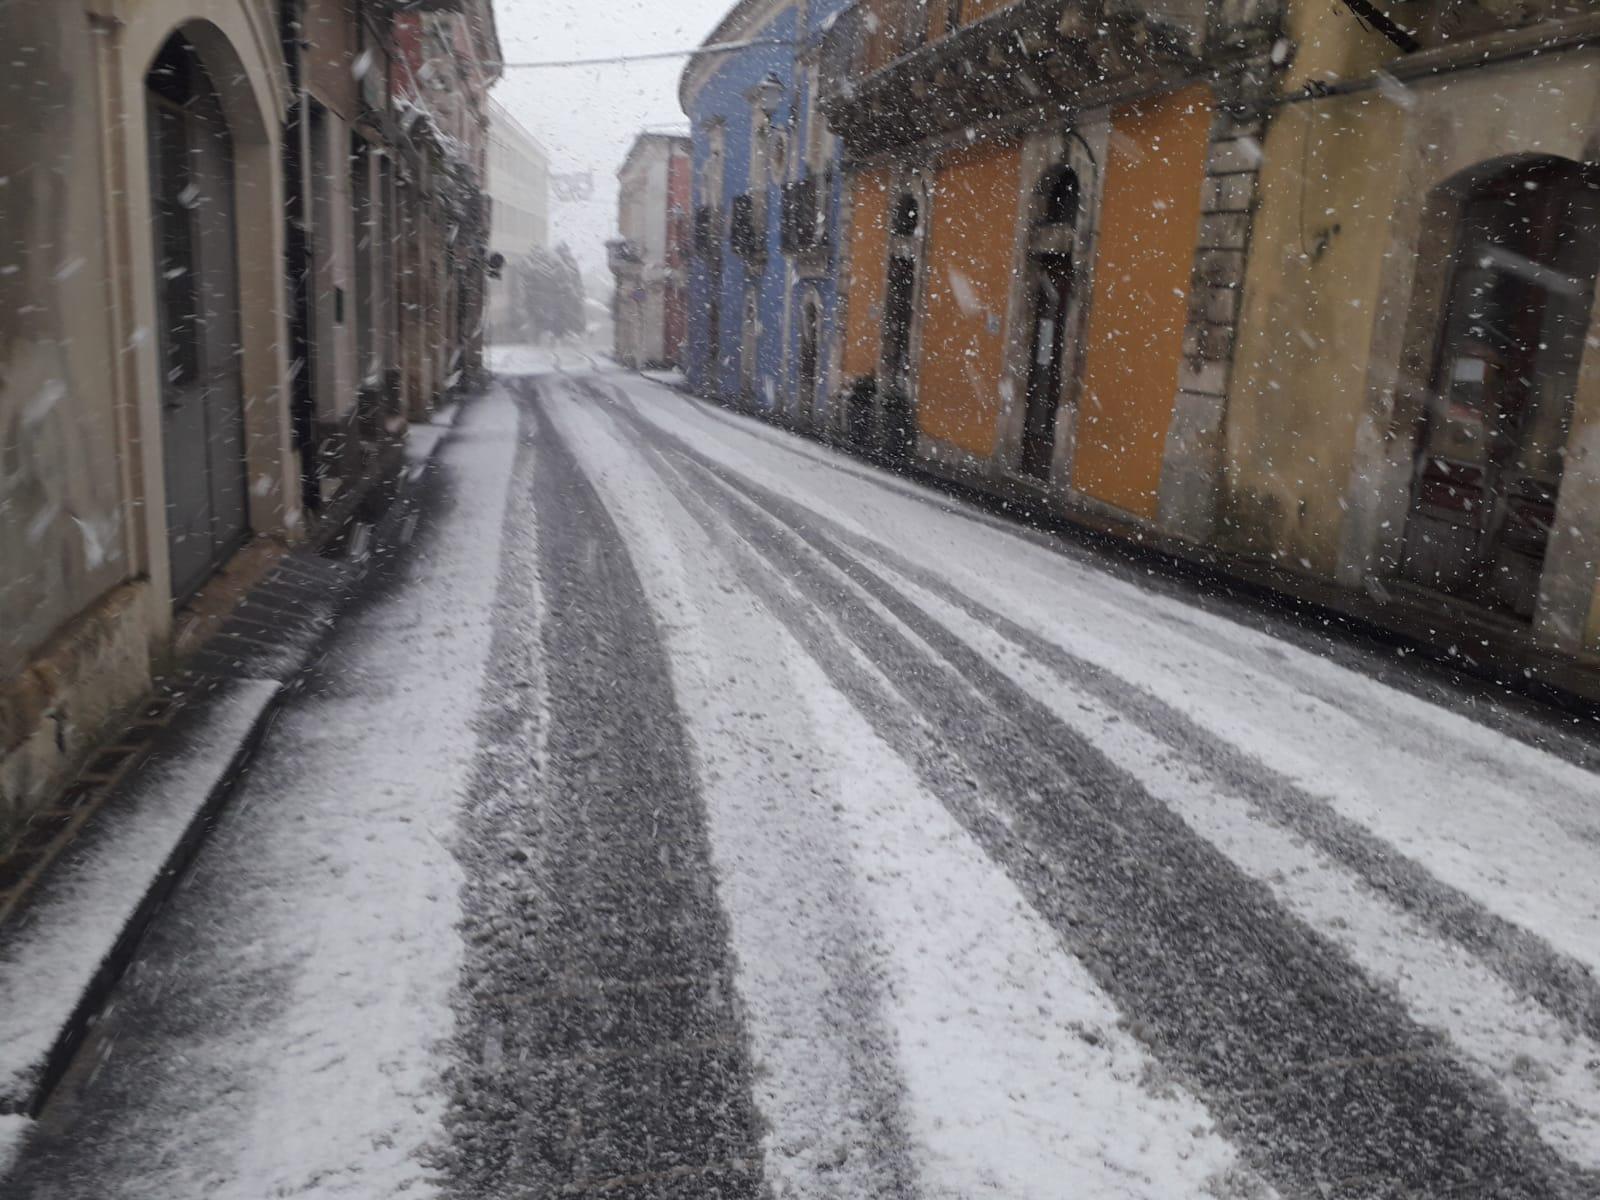 Palazzolo Acreide imbiancata, neve pure a Ferla: grandinate a Floridia e Solarino